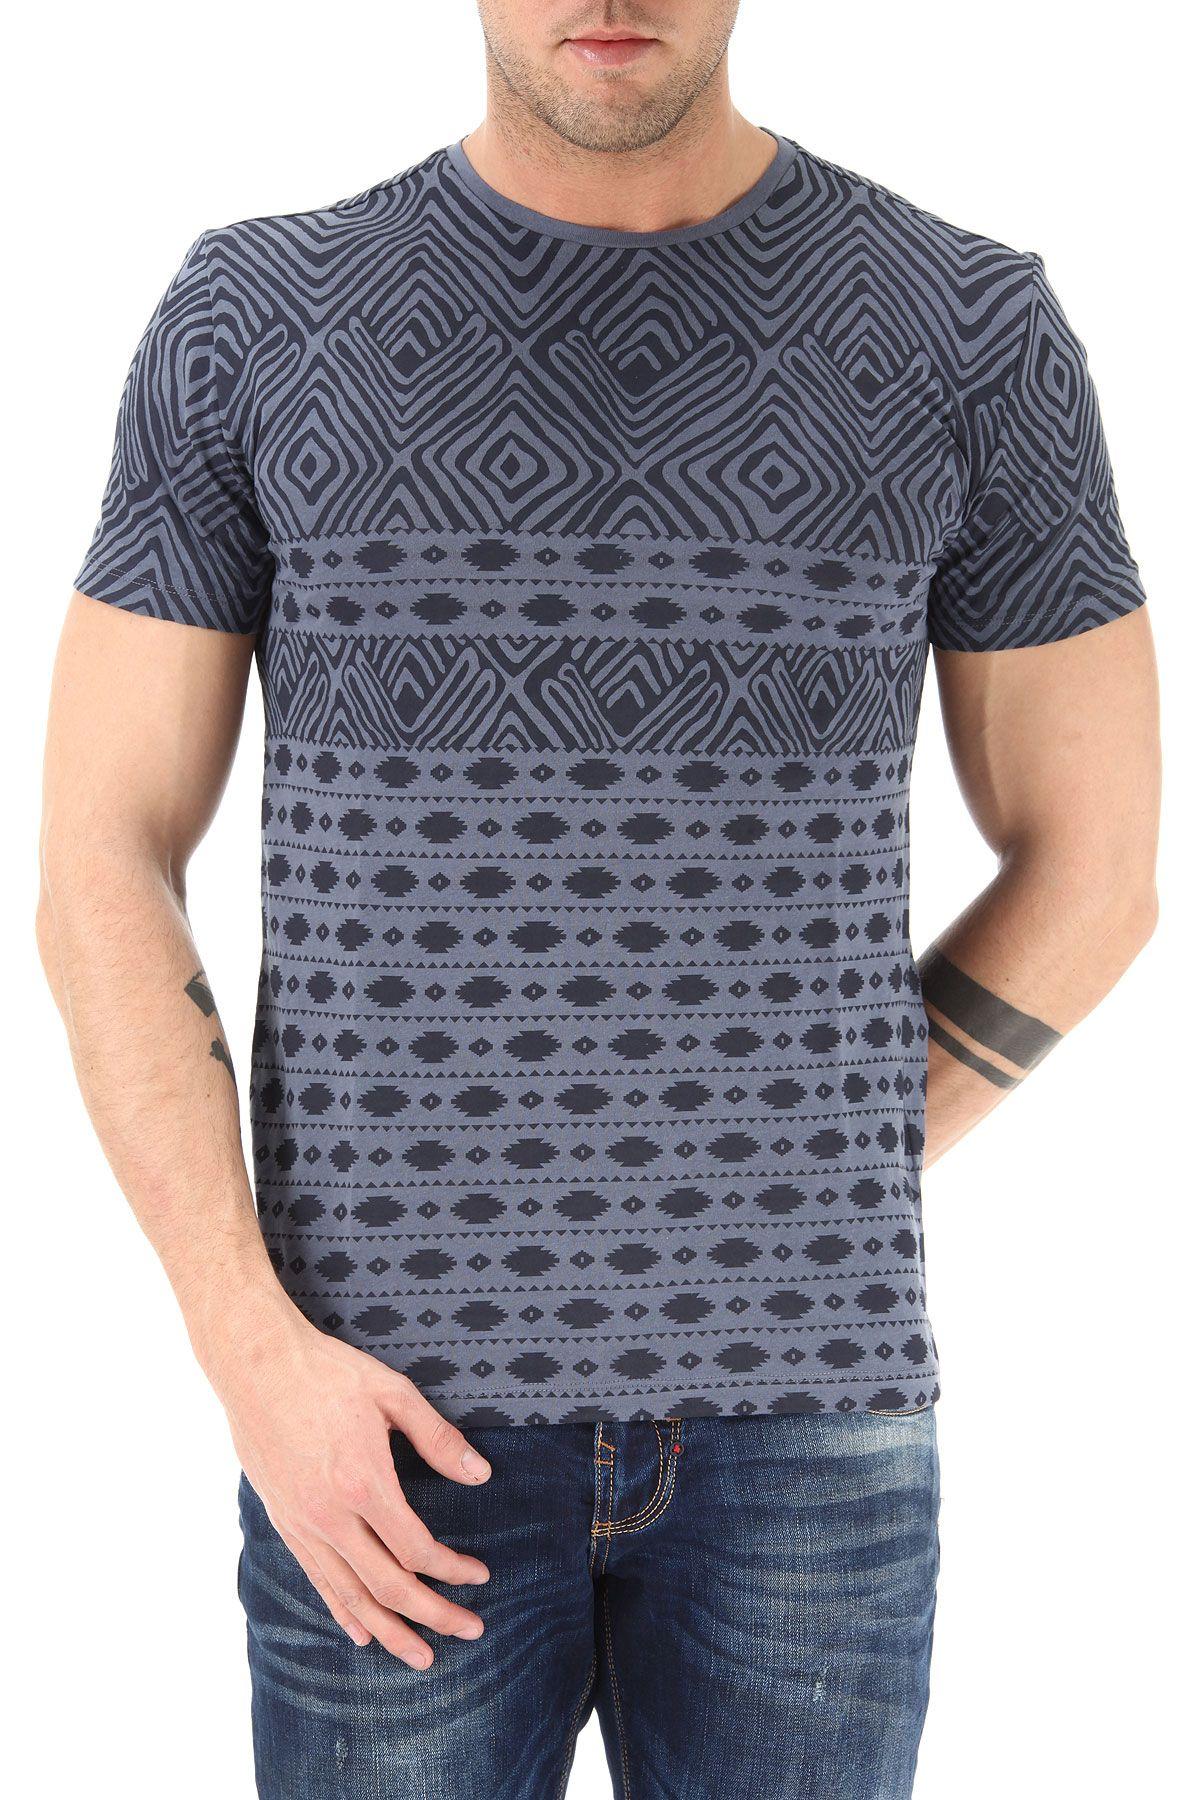 Antony Morato Camiseta de Manga Corta Hombre